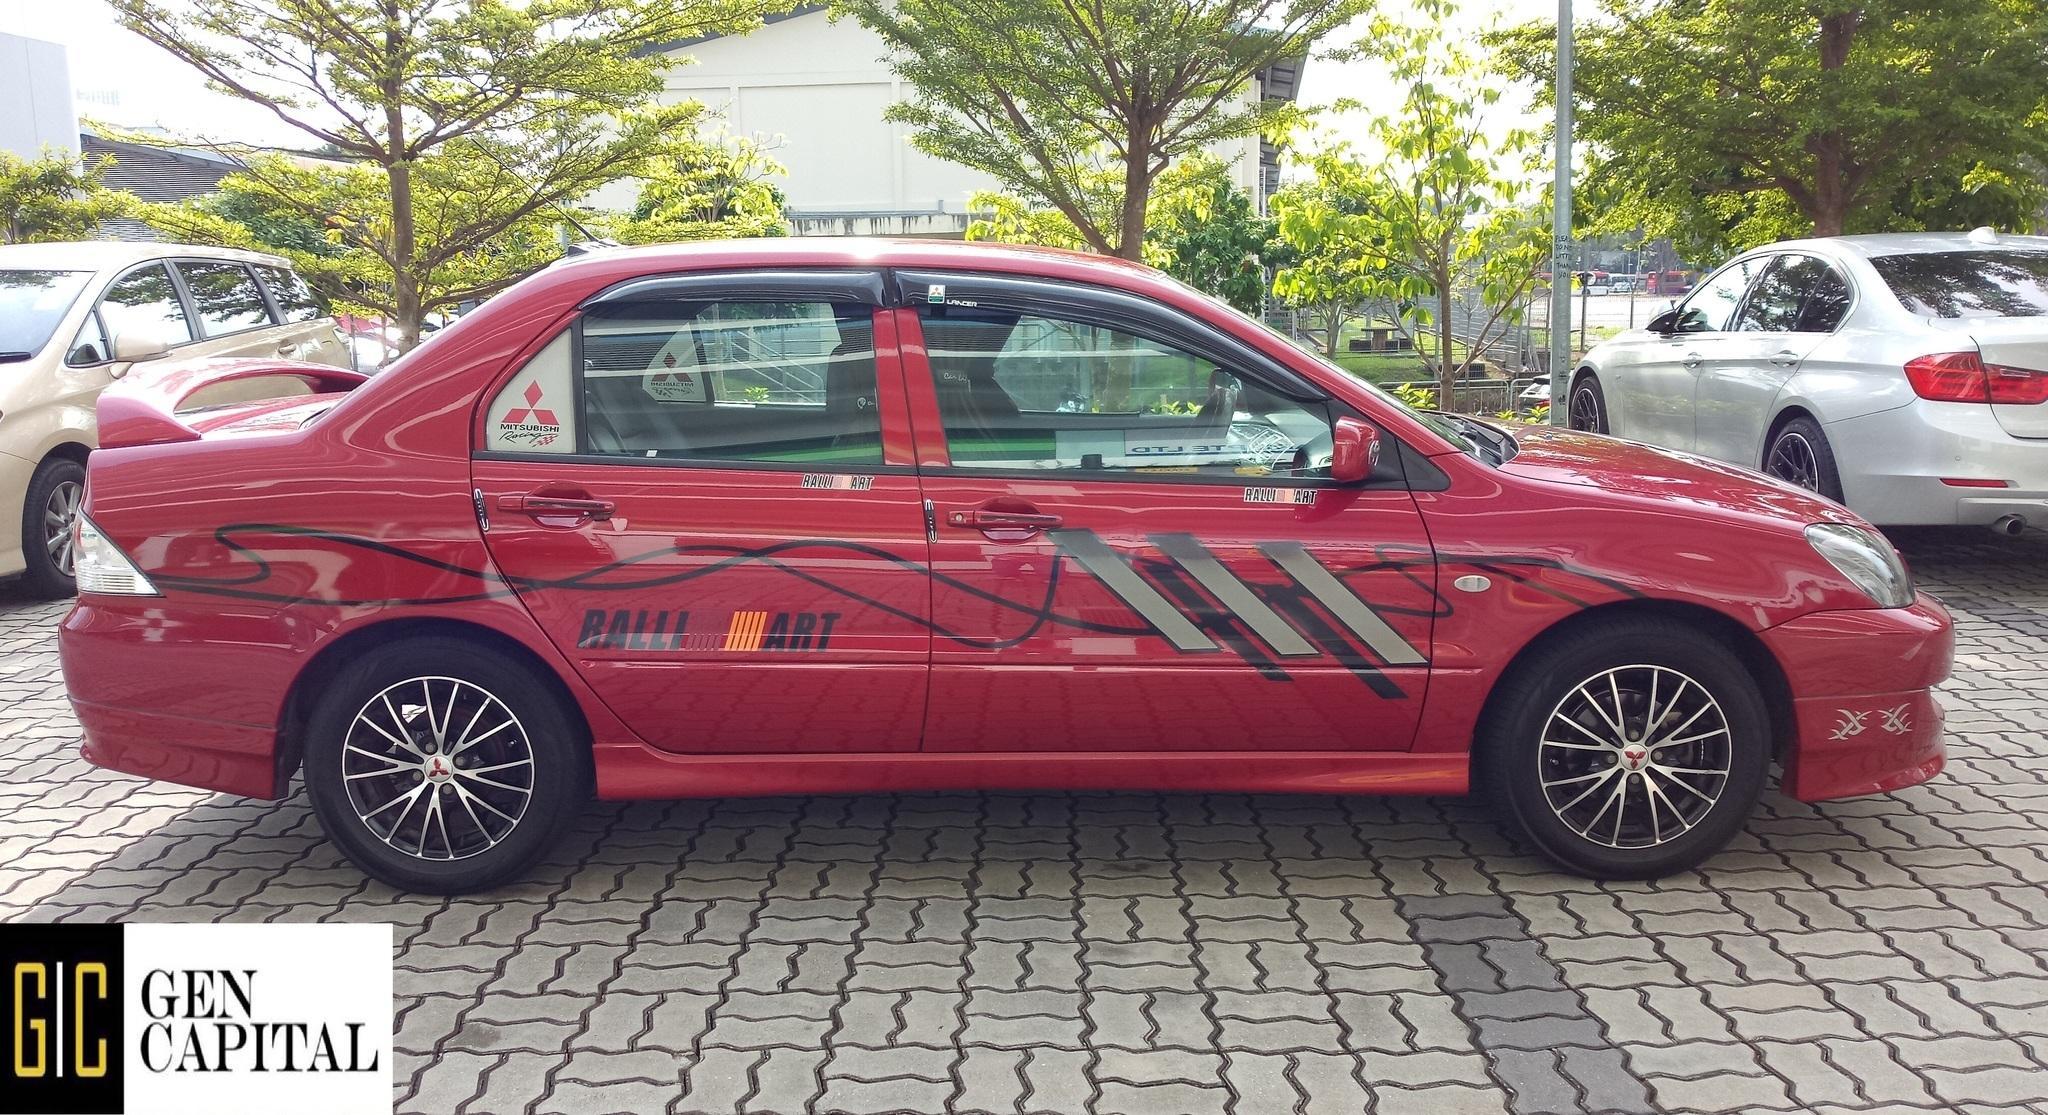 Mitsubishi Lancer 1.5A GLX Affordable Rental Car Svs, Grab Gojek Ryde Tada & Non PHV